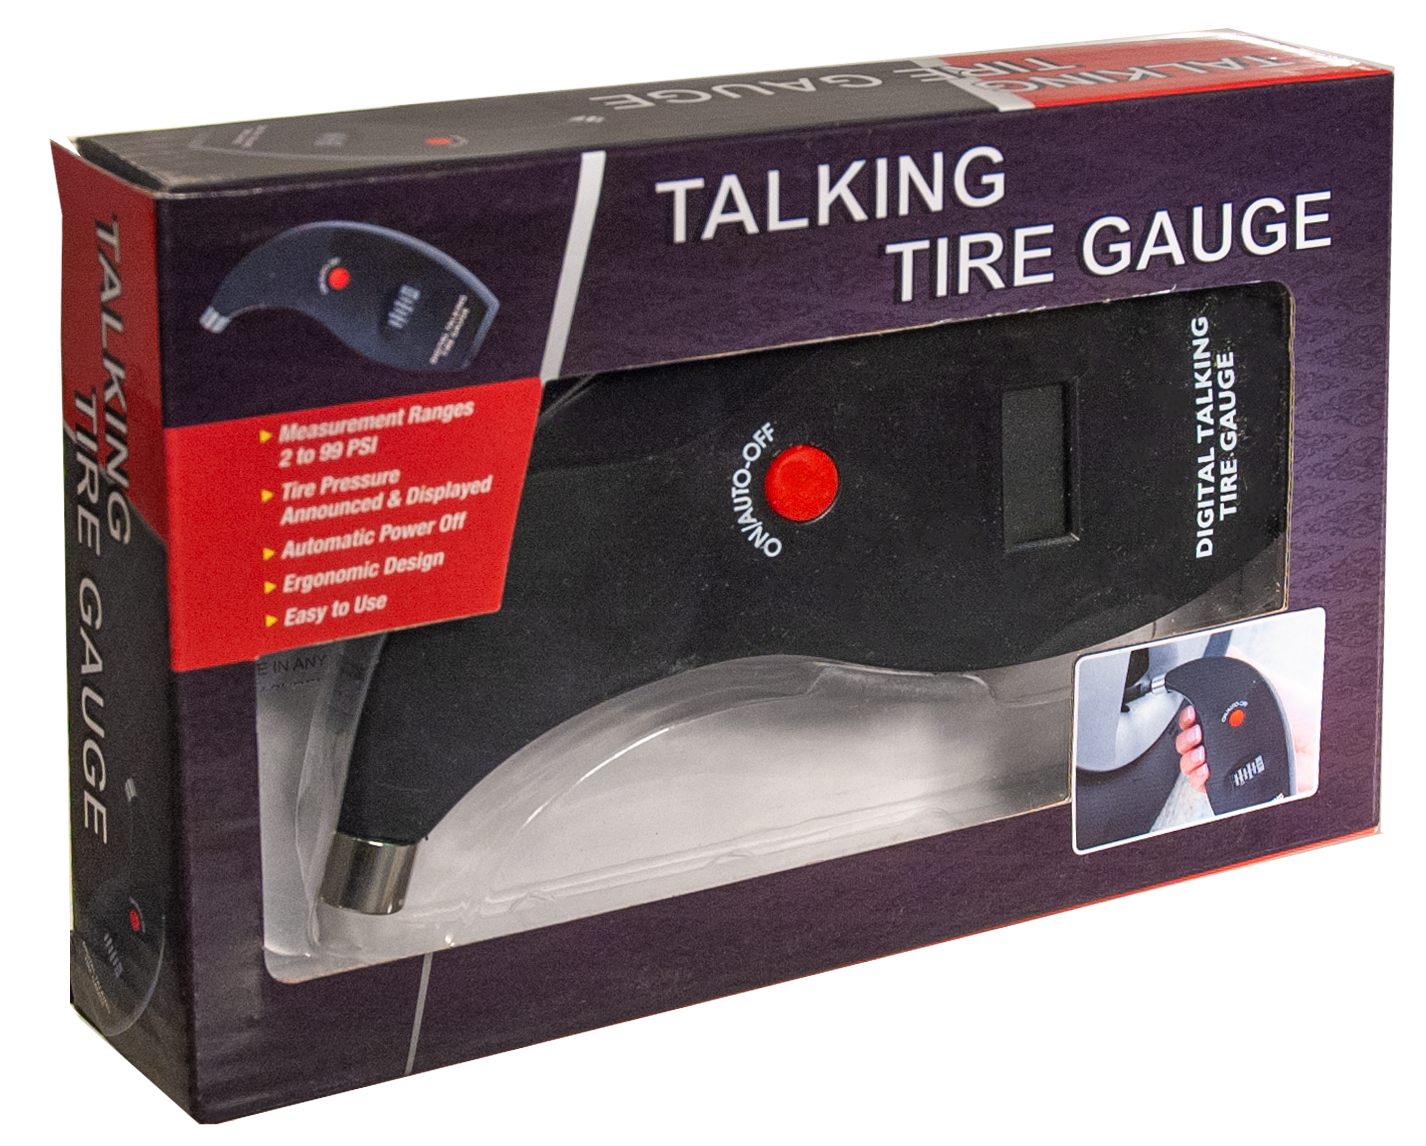 Talking Digital Tire Gauge